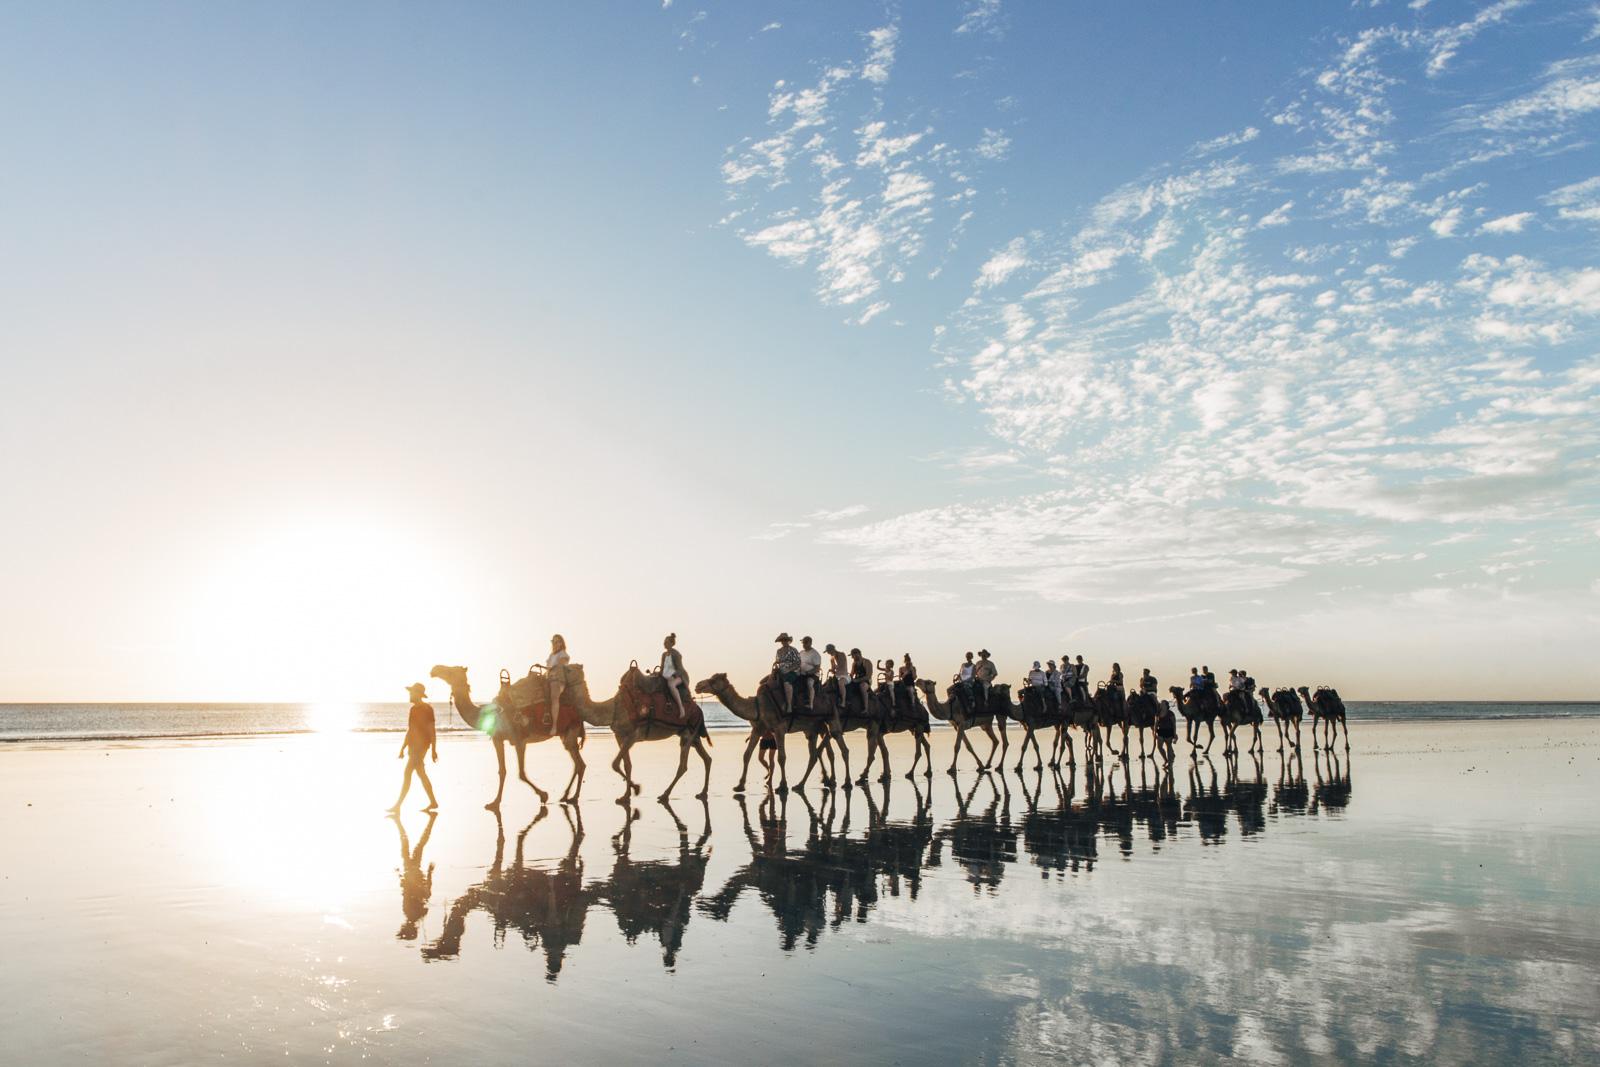 Cable Beach Reflection Camelride